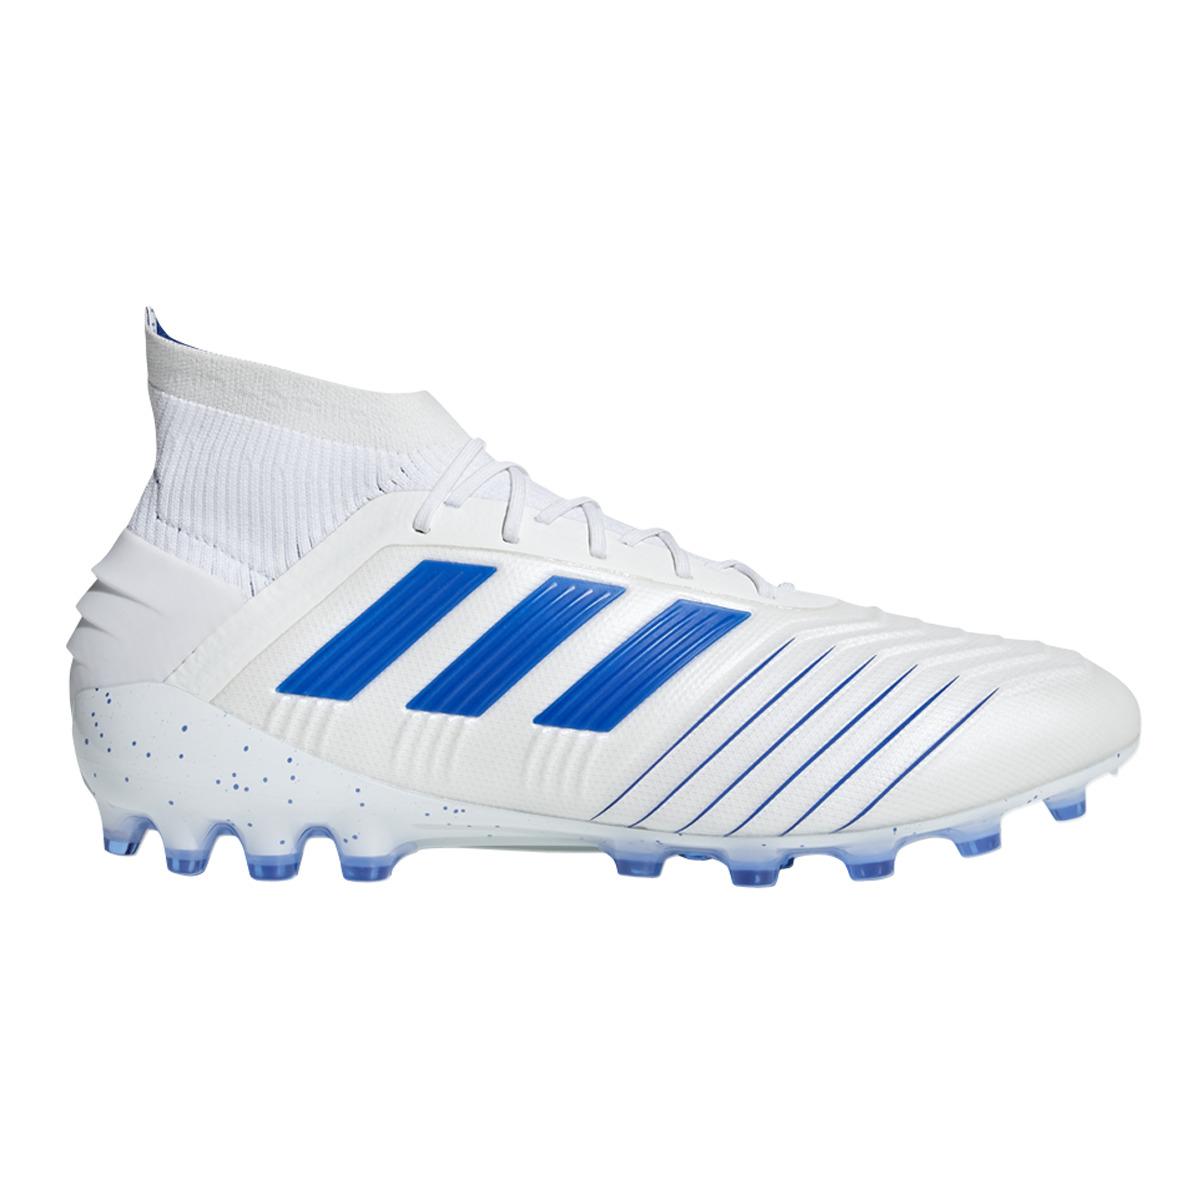 Botas de fútbol de hombre Predator 19.1 AG adidas